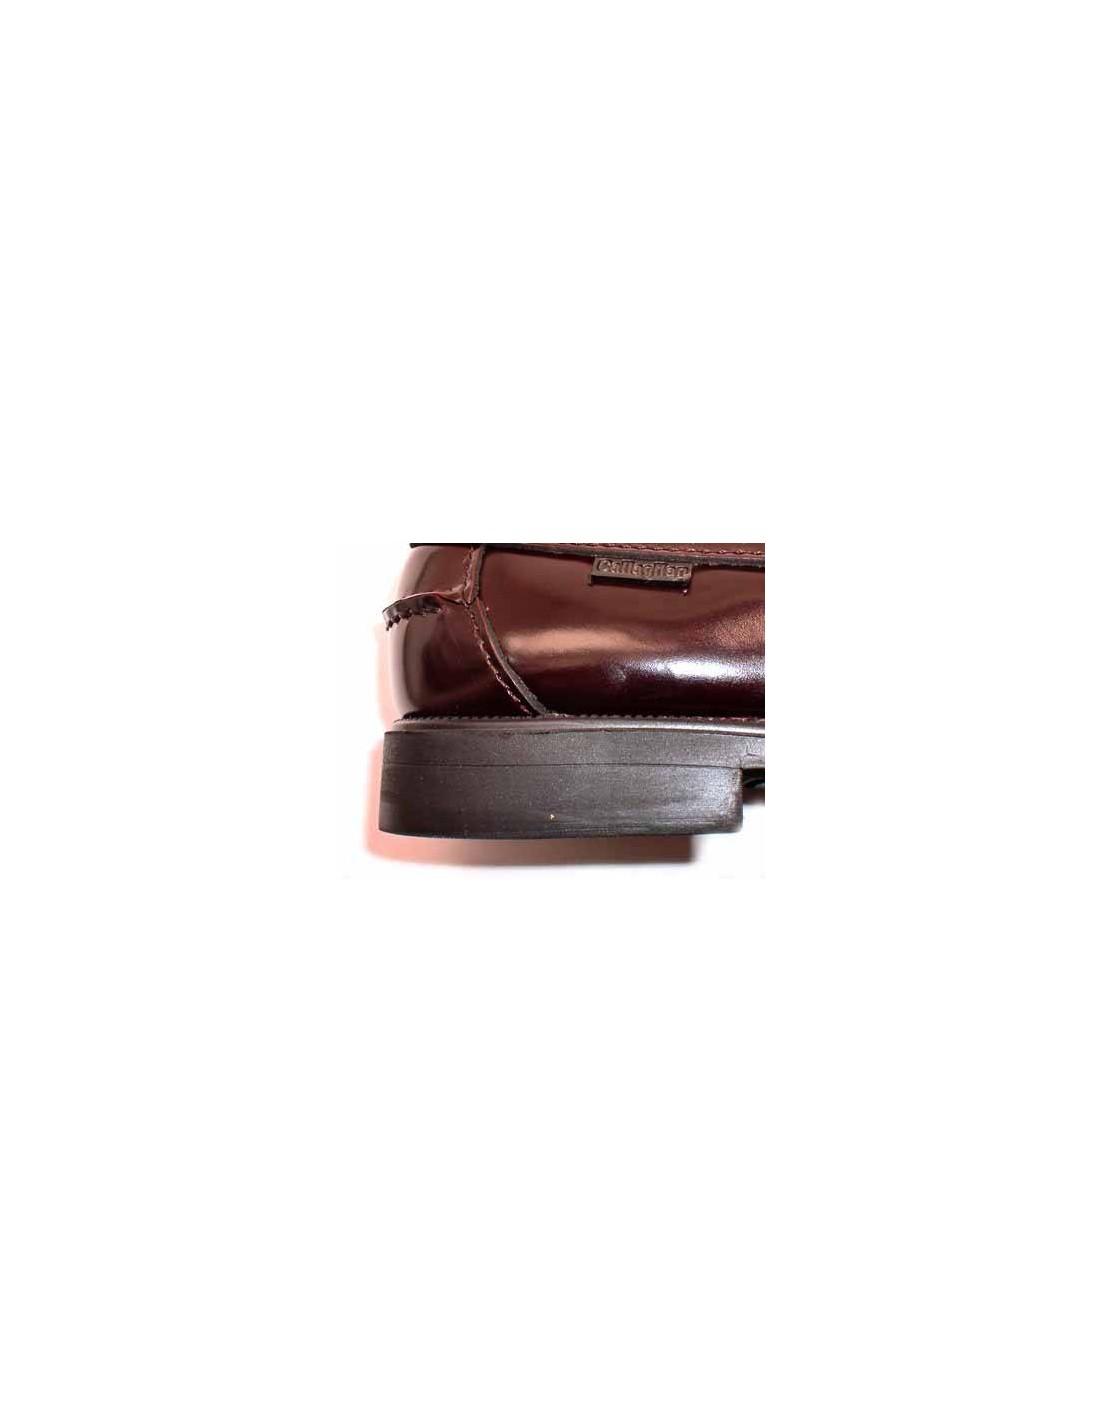 Comprar Online Zapatos Fluchos Only Profesional 6275 91352b5611b9